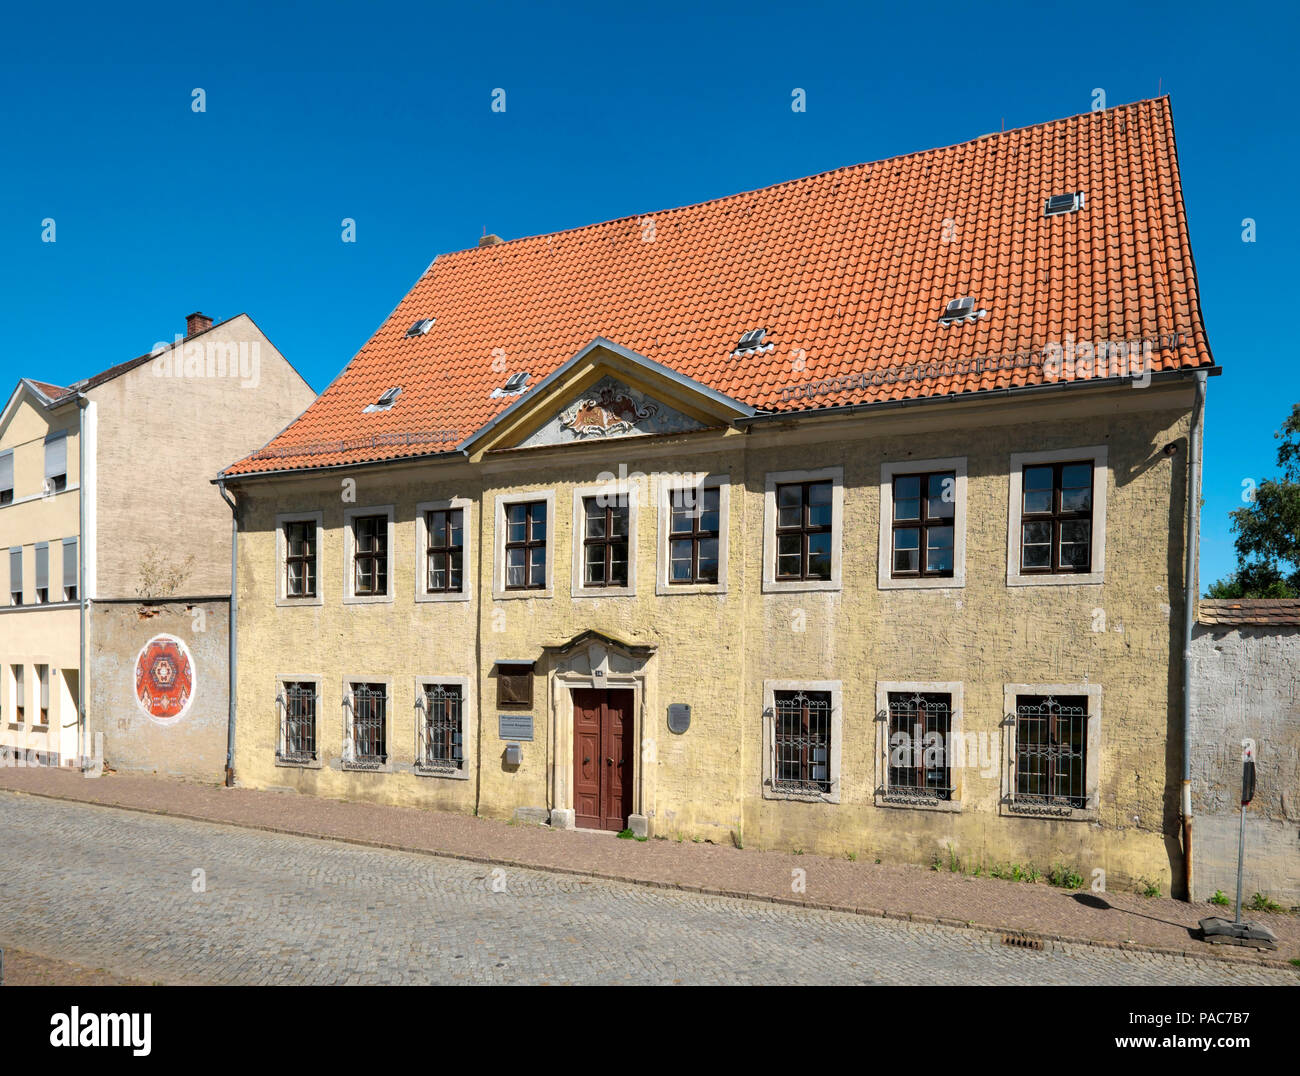 Lugar de nacimiento de Joachim Ringelnatz, que nació aquí en el 7.8.1883 como Hans Gustav Bötticher, Rigelnatzstadt Wurzen, Sajonia Imagen De Stock